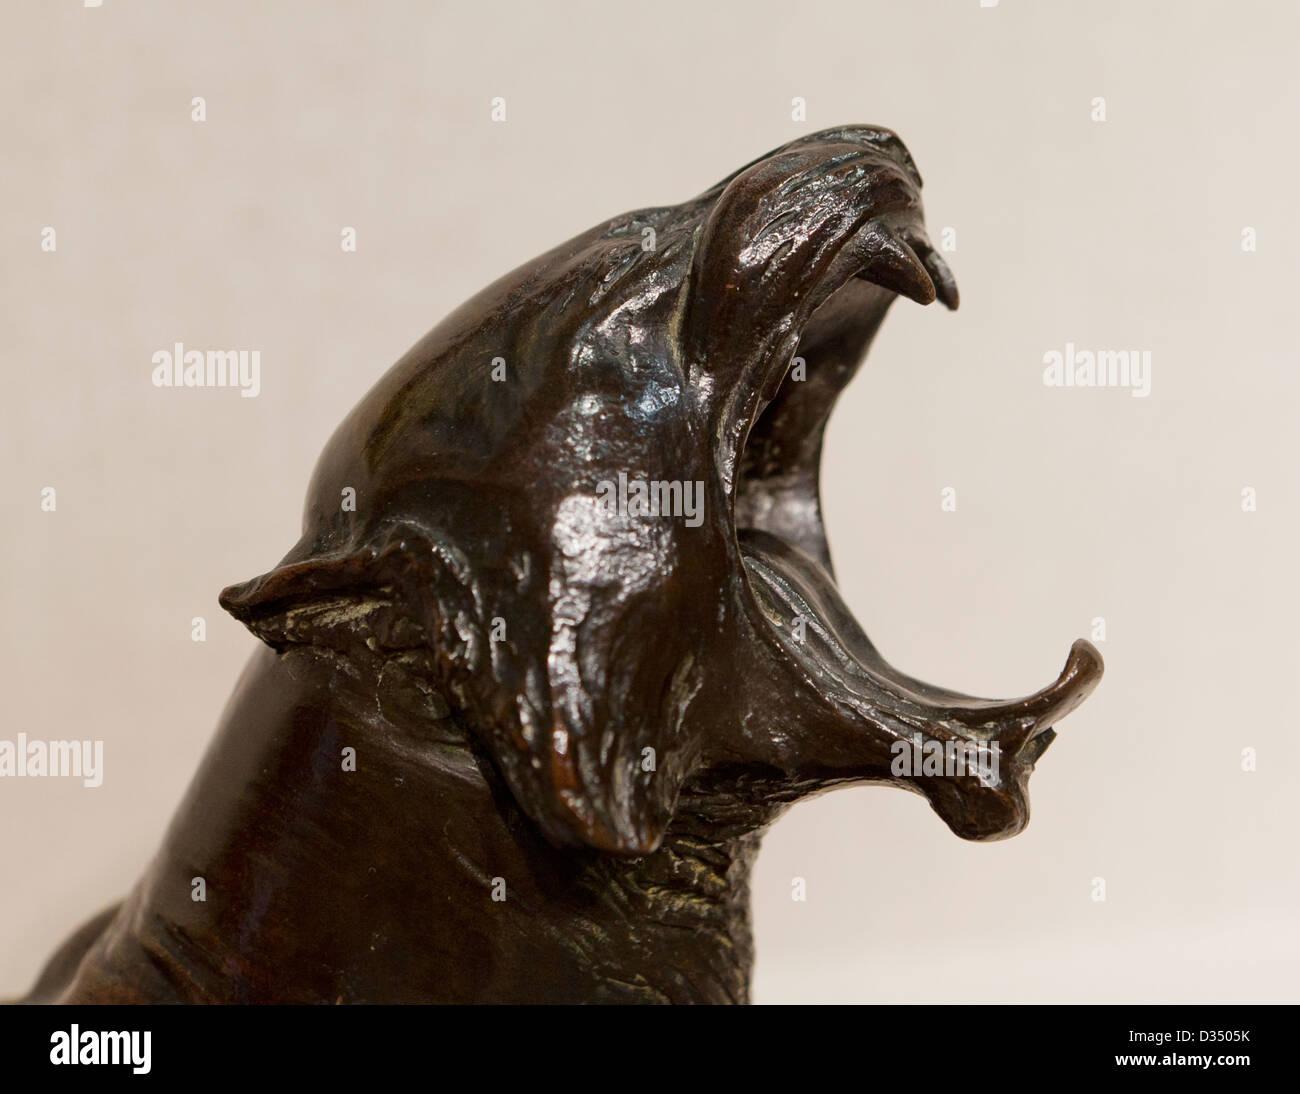 Yawning tiger sculpture - Stock Image